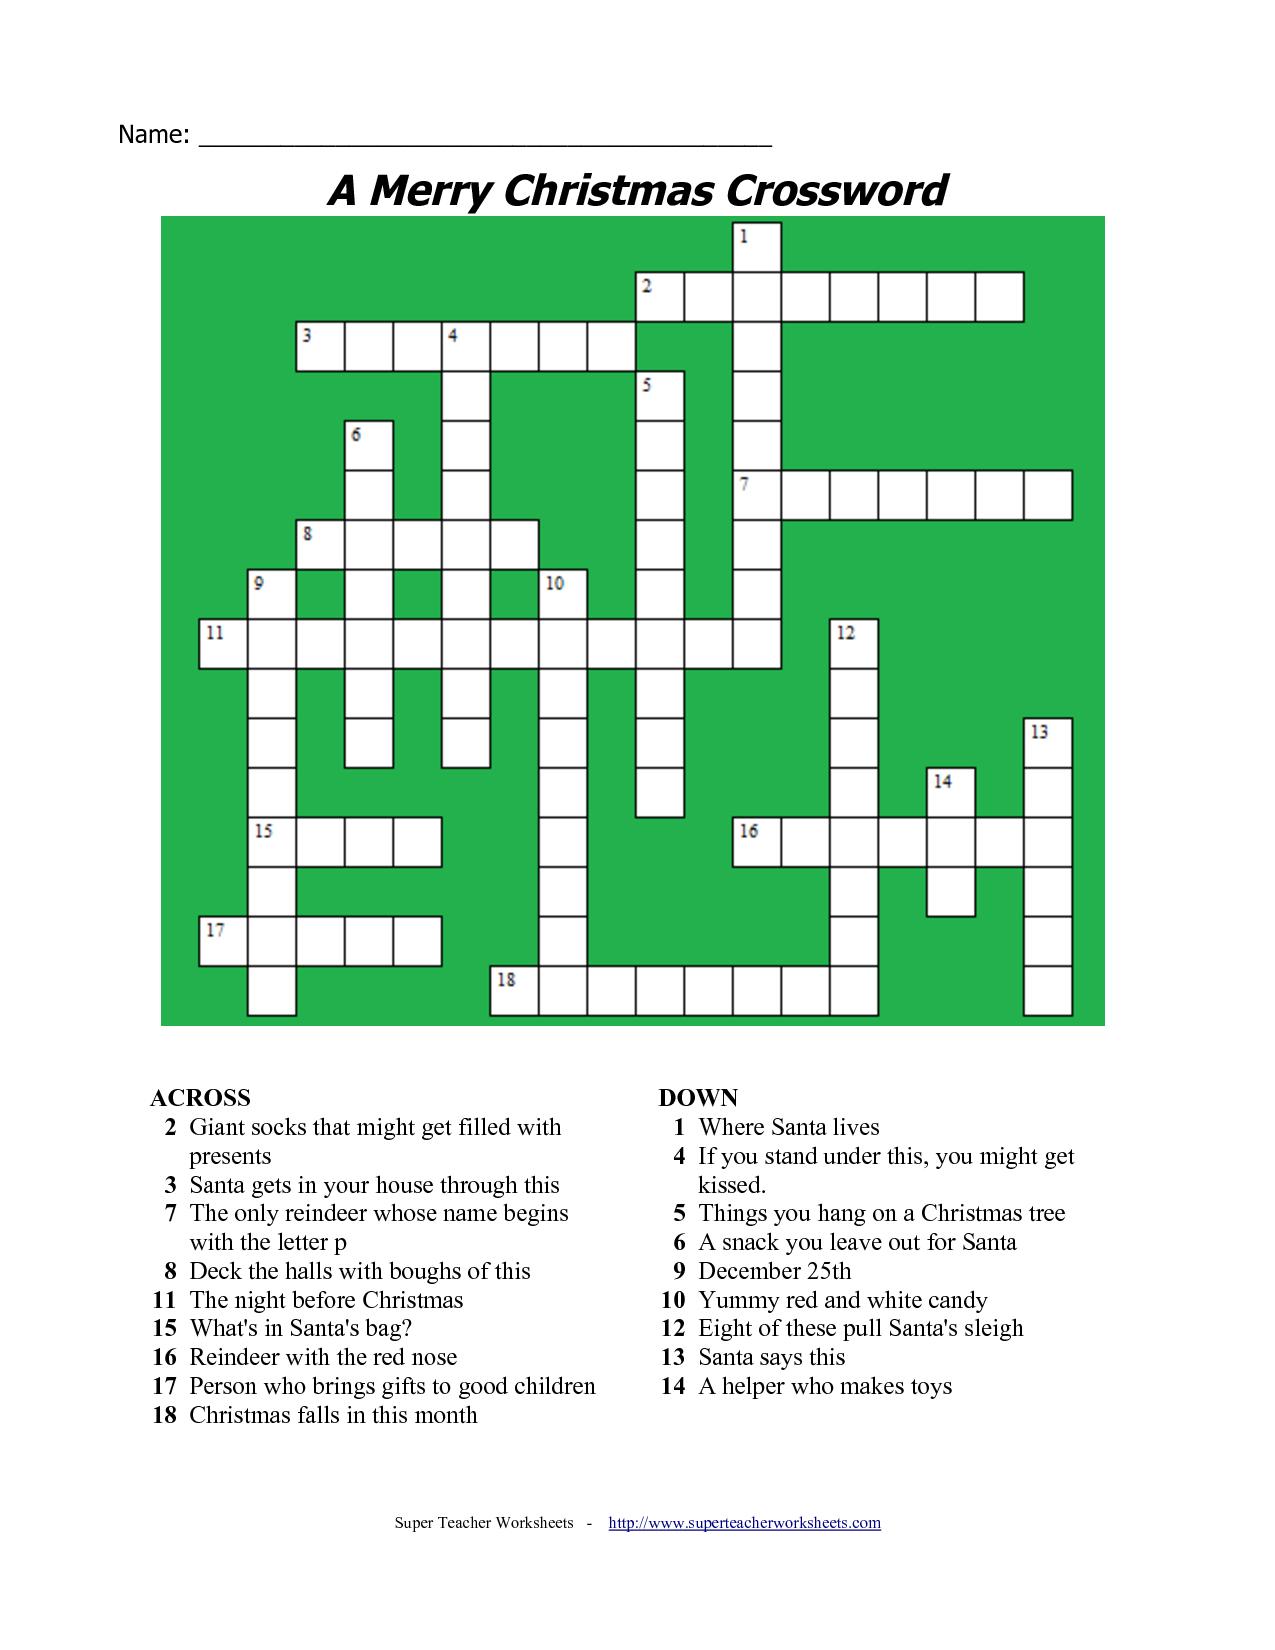 20 Fun Printable Christmas Crossword Puzzles | Kittybabylove - Printable English Crossword Puzzles With Answers Pdf